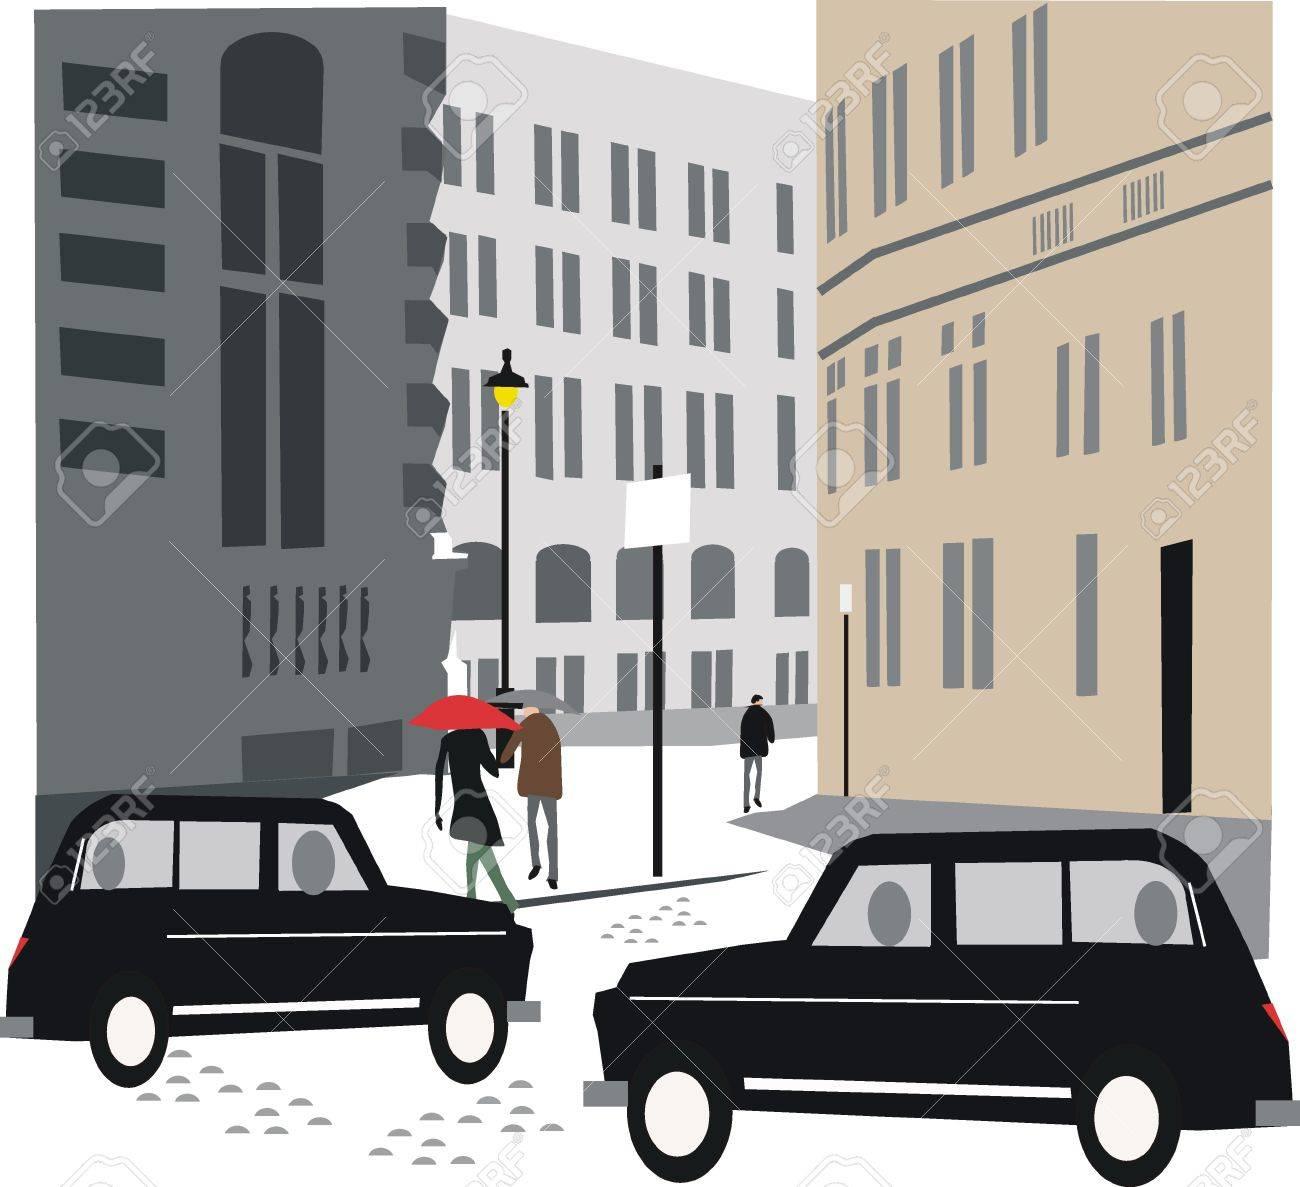 London taxi illustration Stock Vector - 8587337